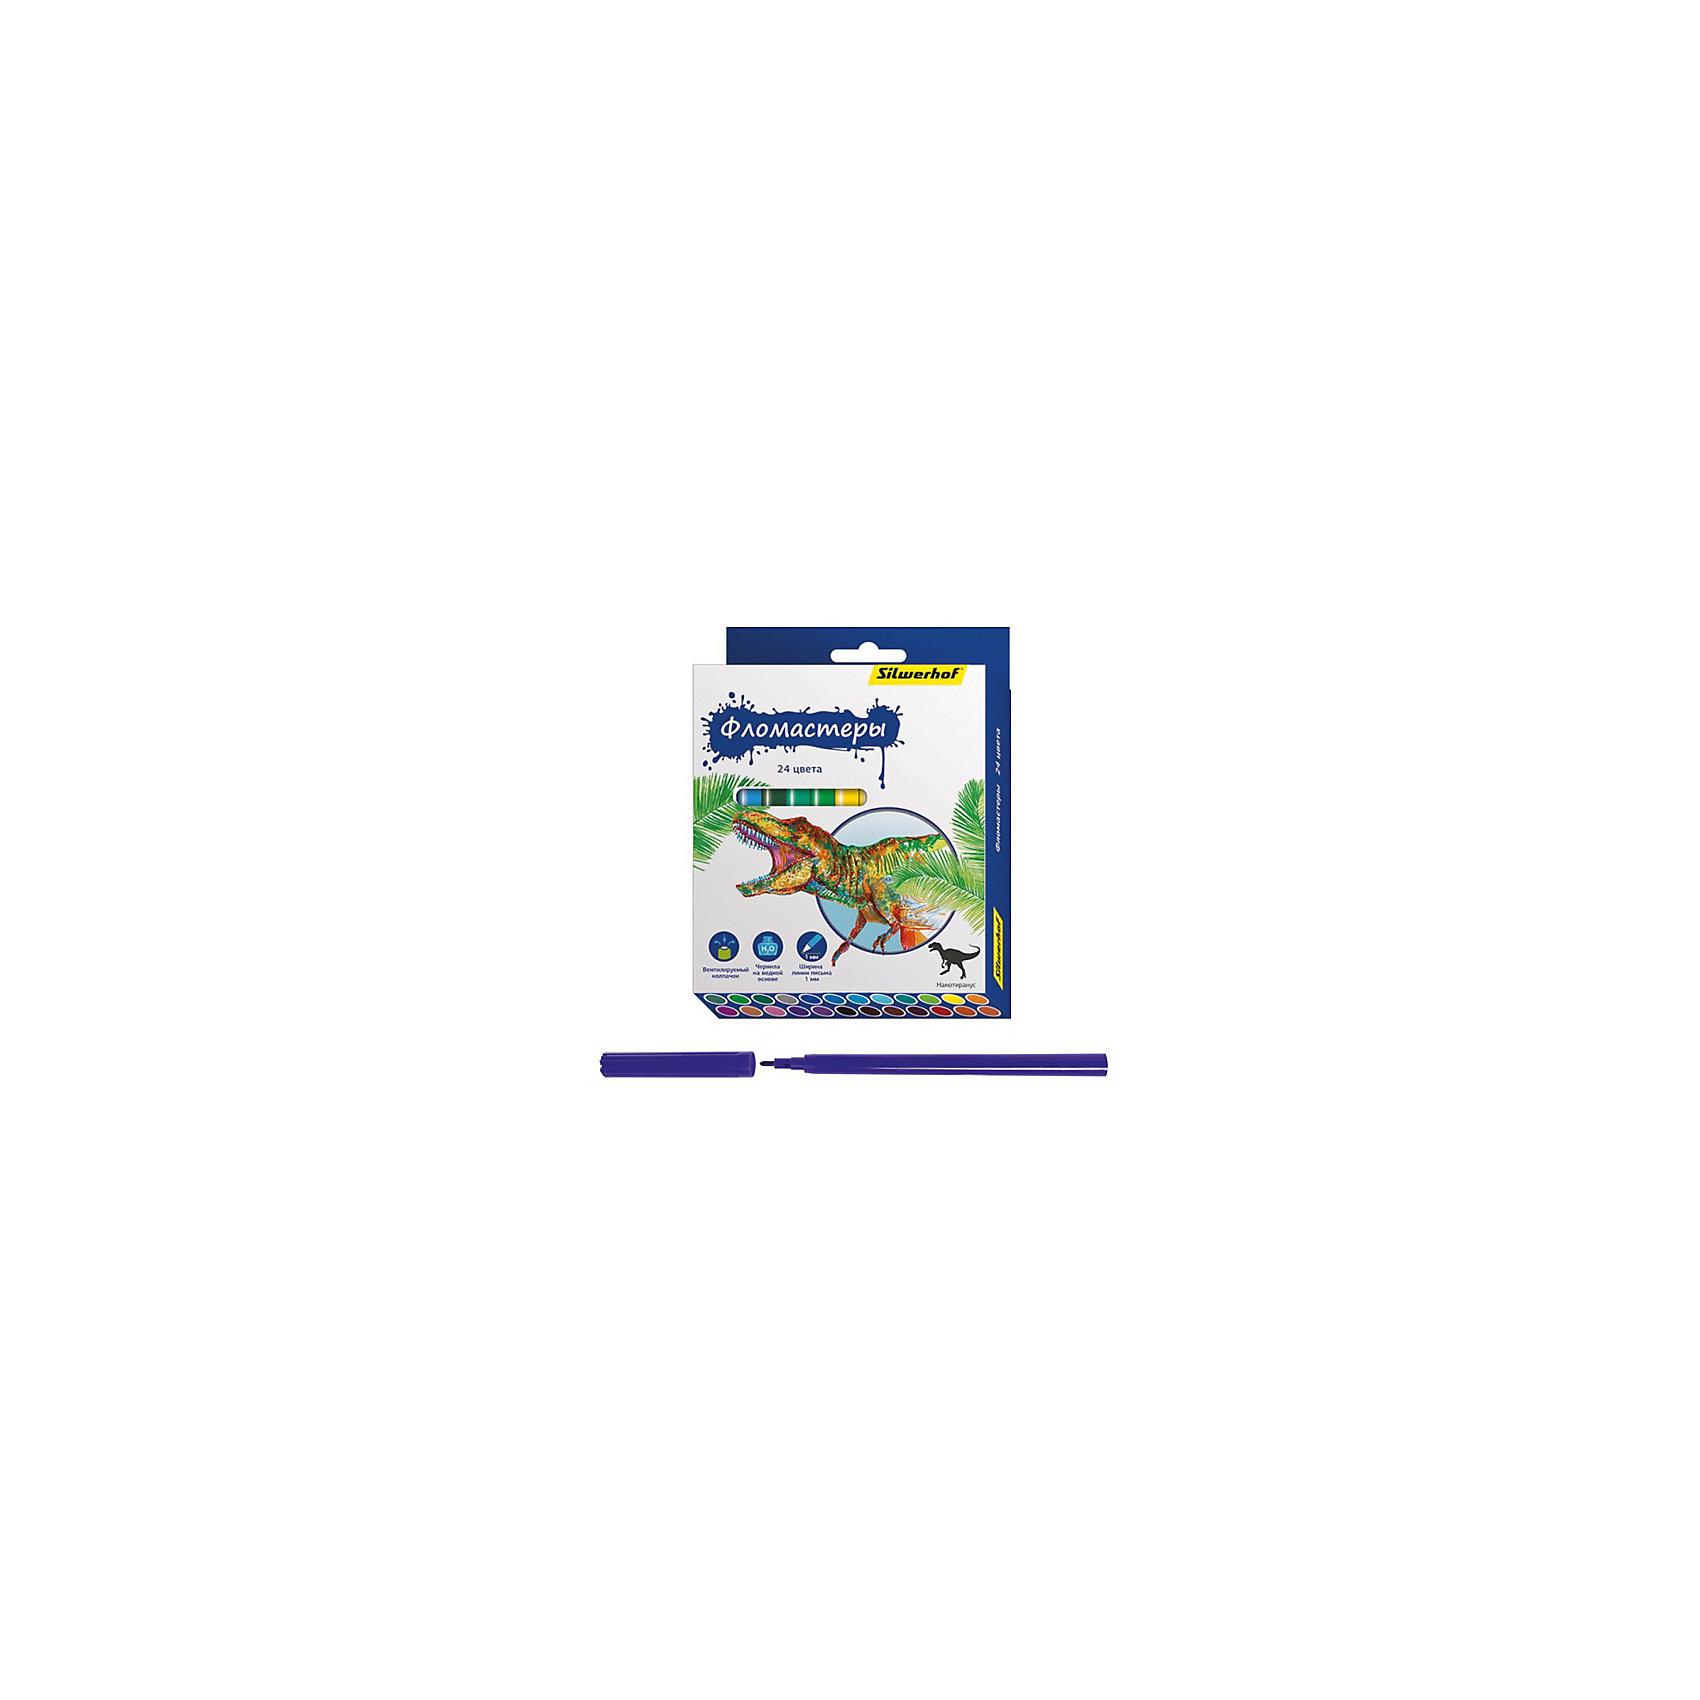 Silwerhof Фломастеры, 24цв, ДИНОЗАВРЫ фломастеры mattel фломастеры 24 цвета ever after high фиолетовые картонная упаковка